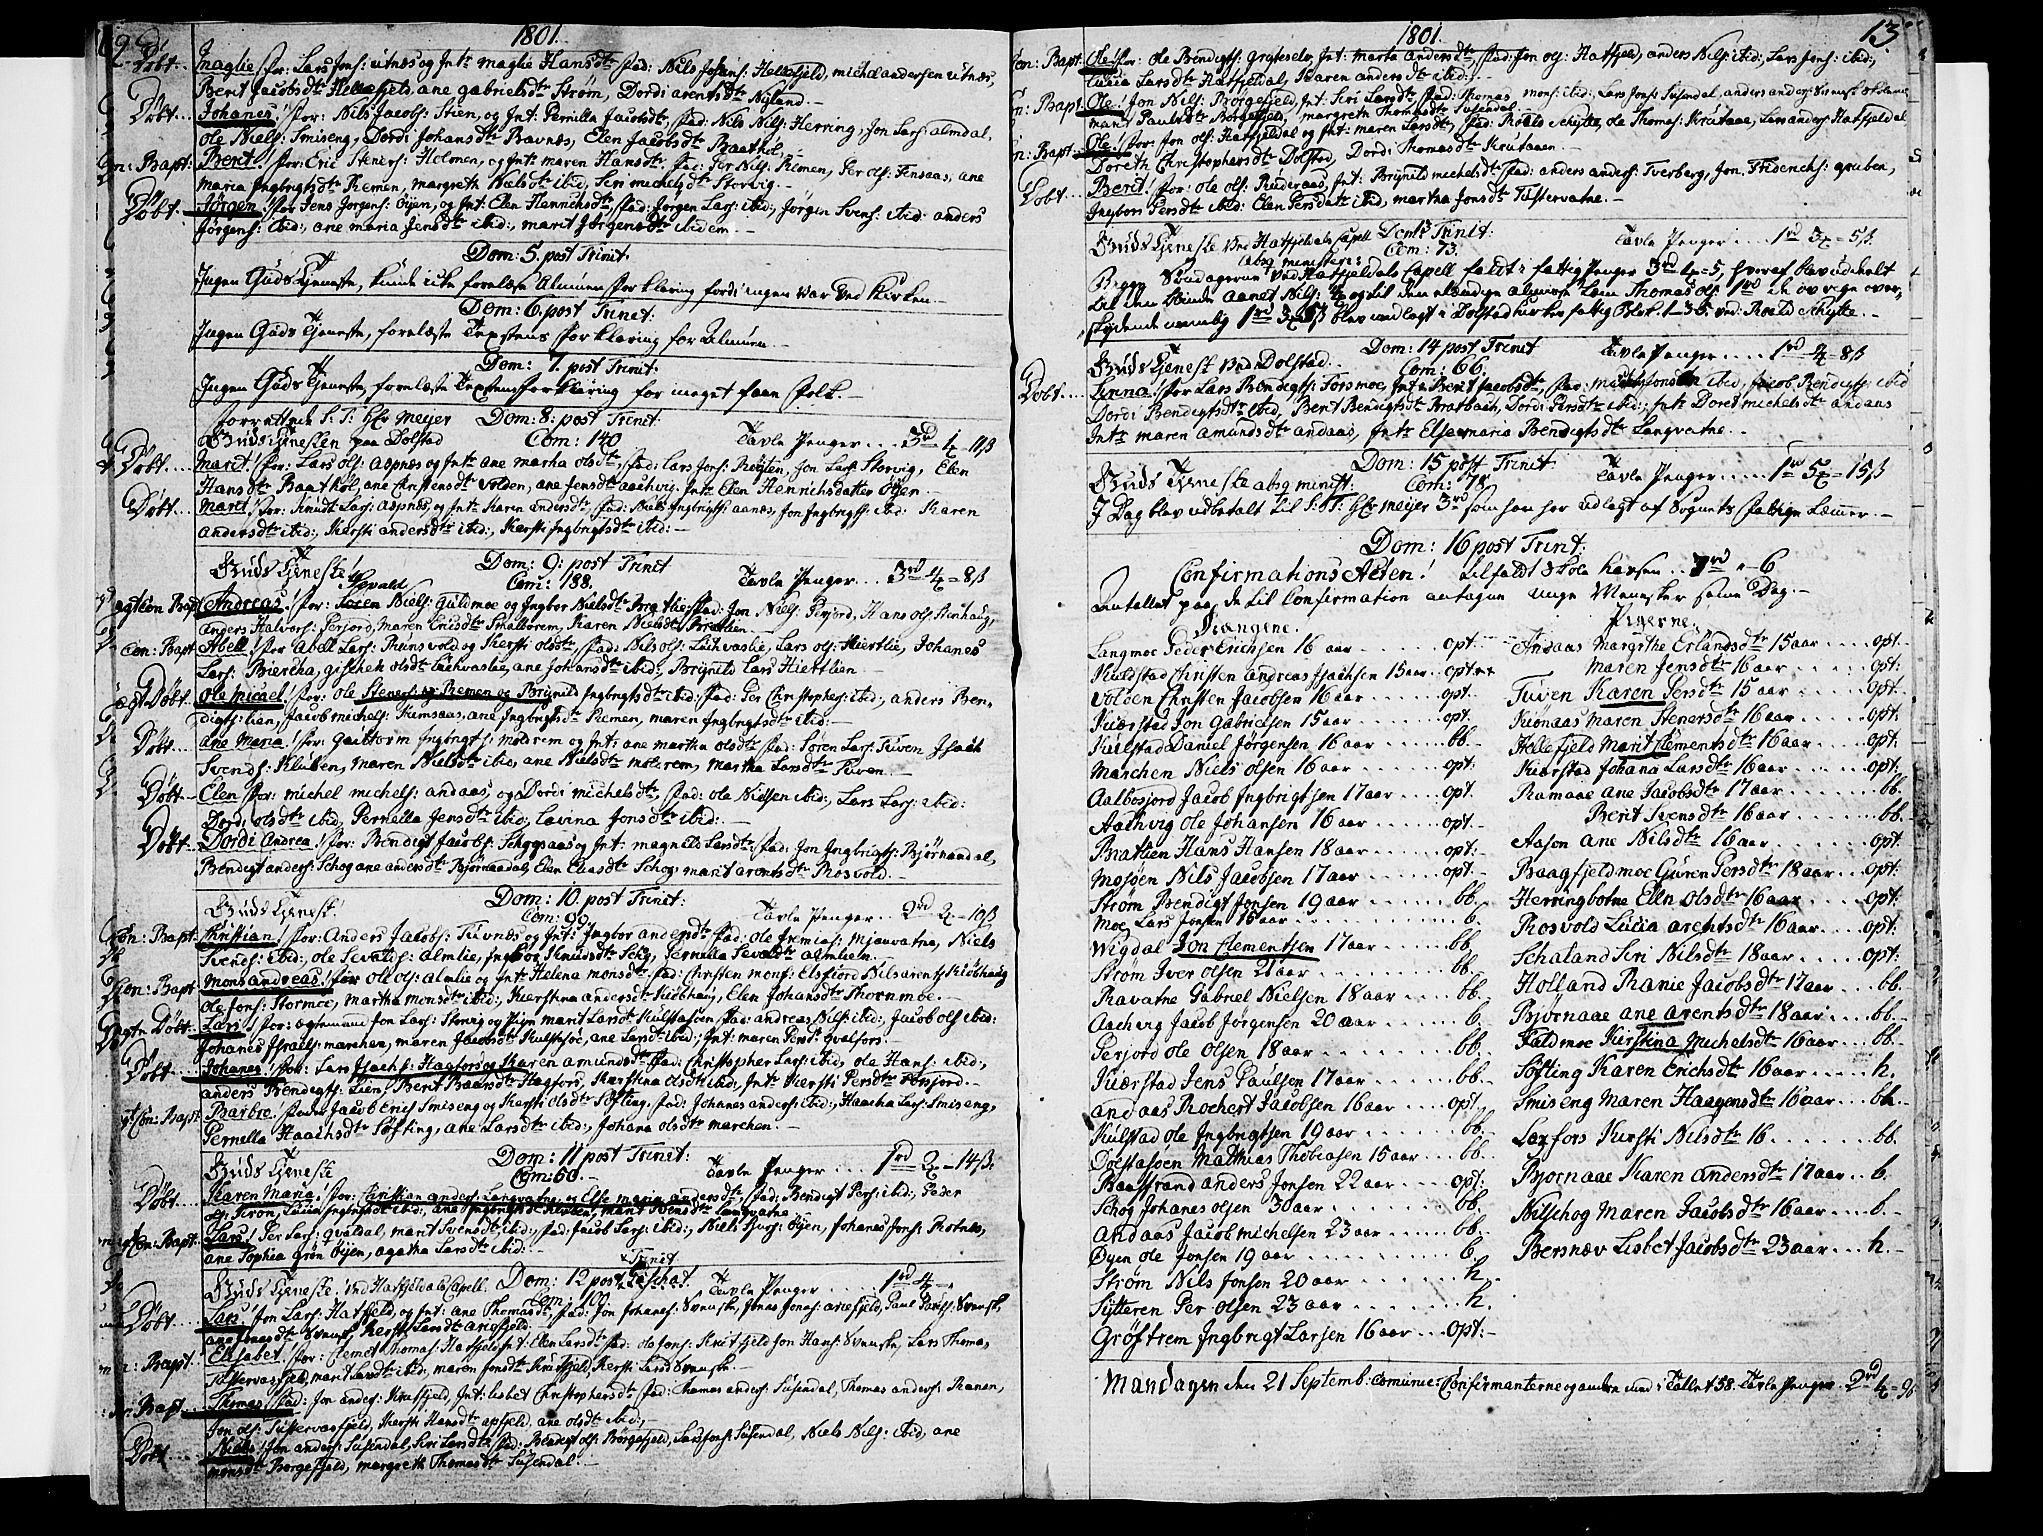 SAT, Ministerialprotokoller, klokkerbøker og fødselsregistre - Nordland, 820/L0287: Ministerialbok nr. 820A08, 1800-1819, s. 12-13